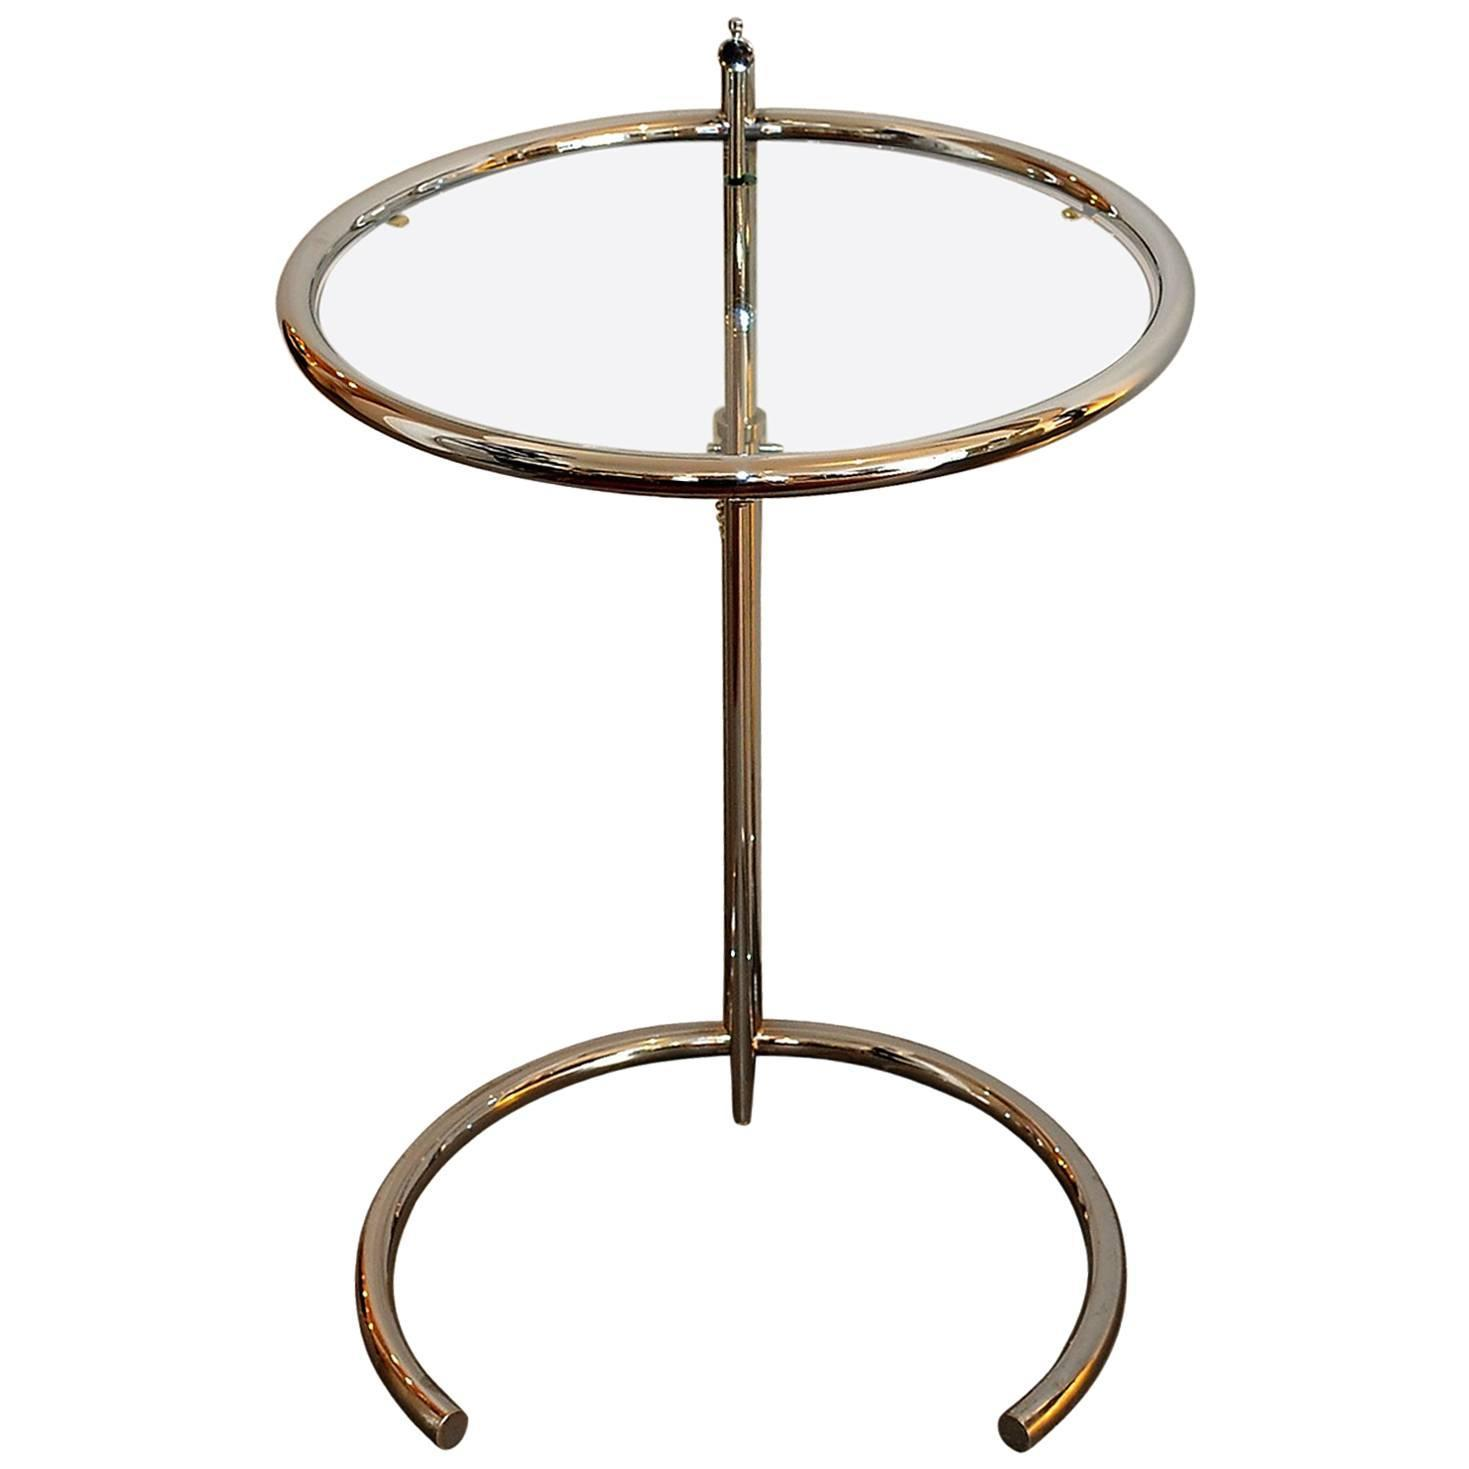 vintage original adjustable table e 1027 eileen gray 1927 at 1stdibs